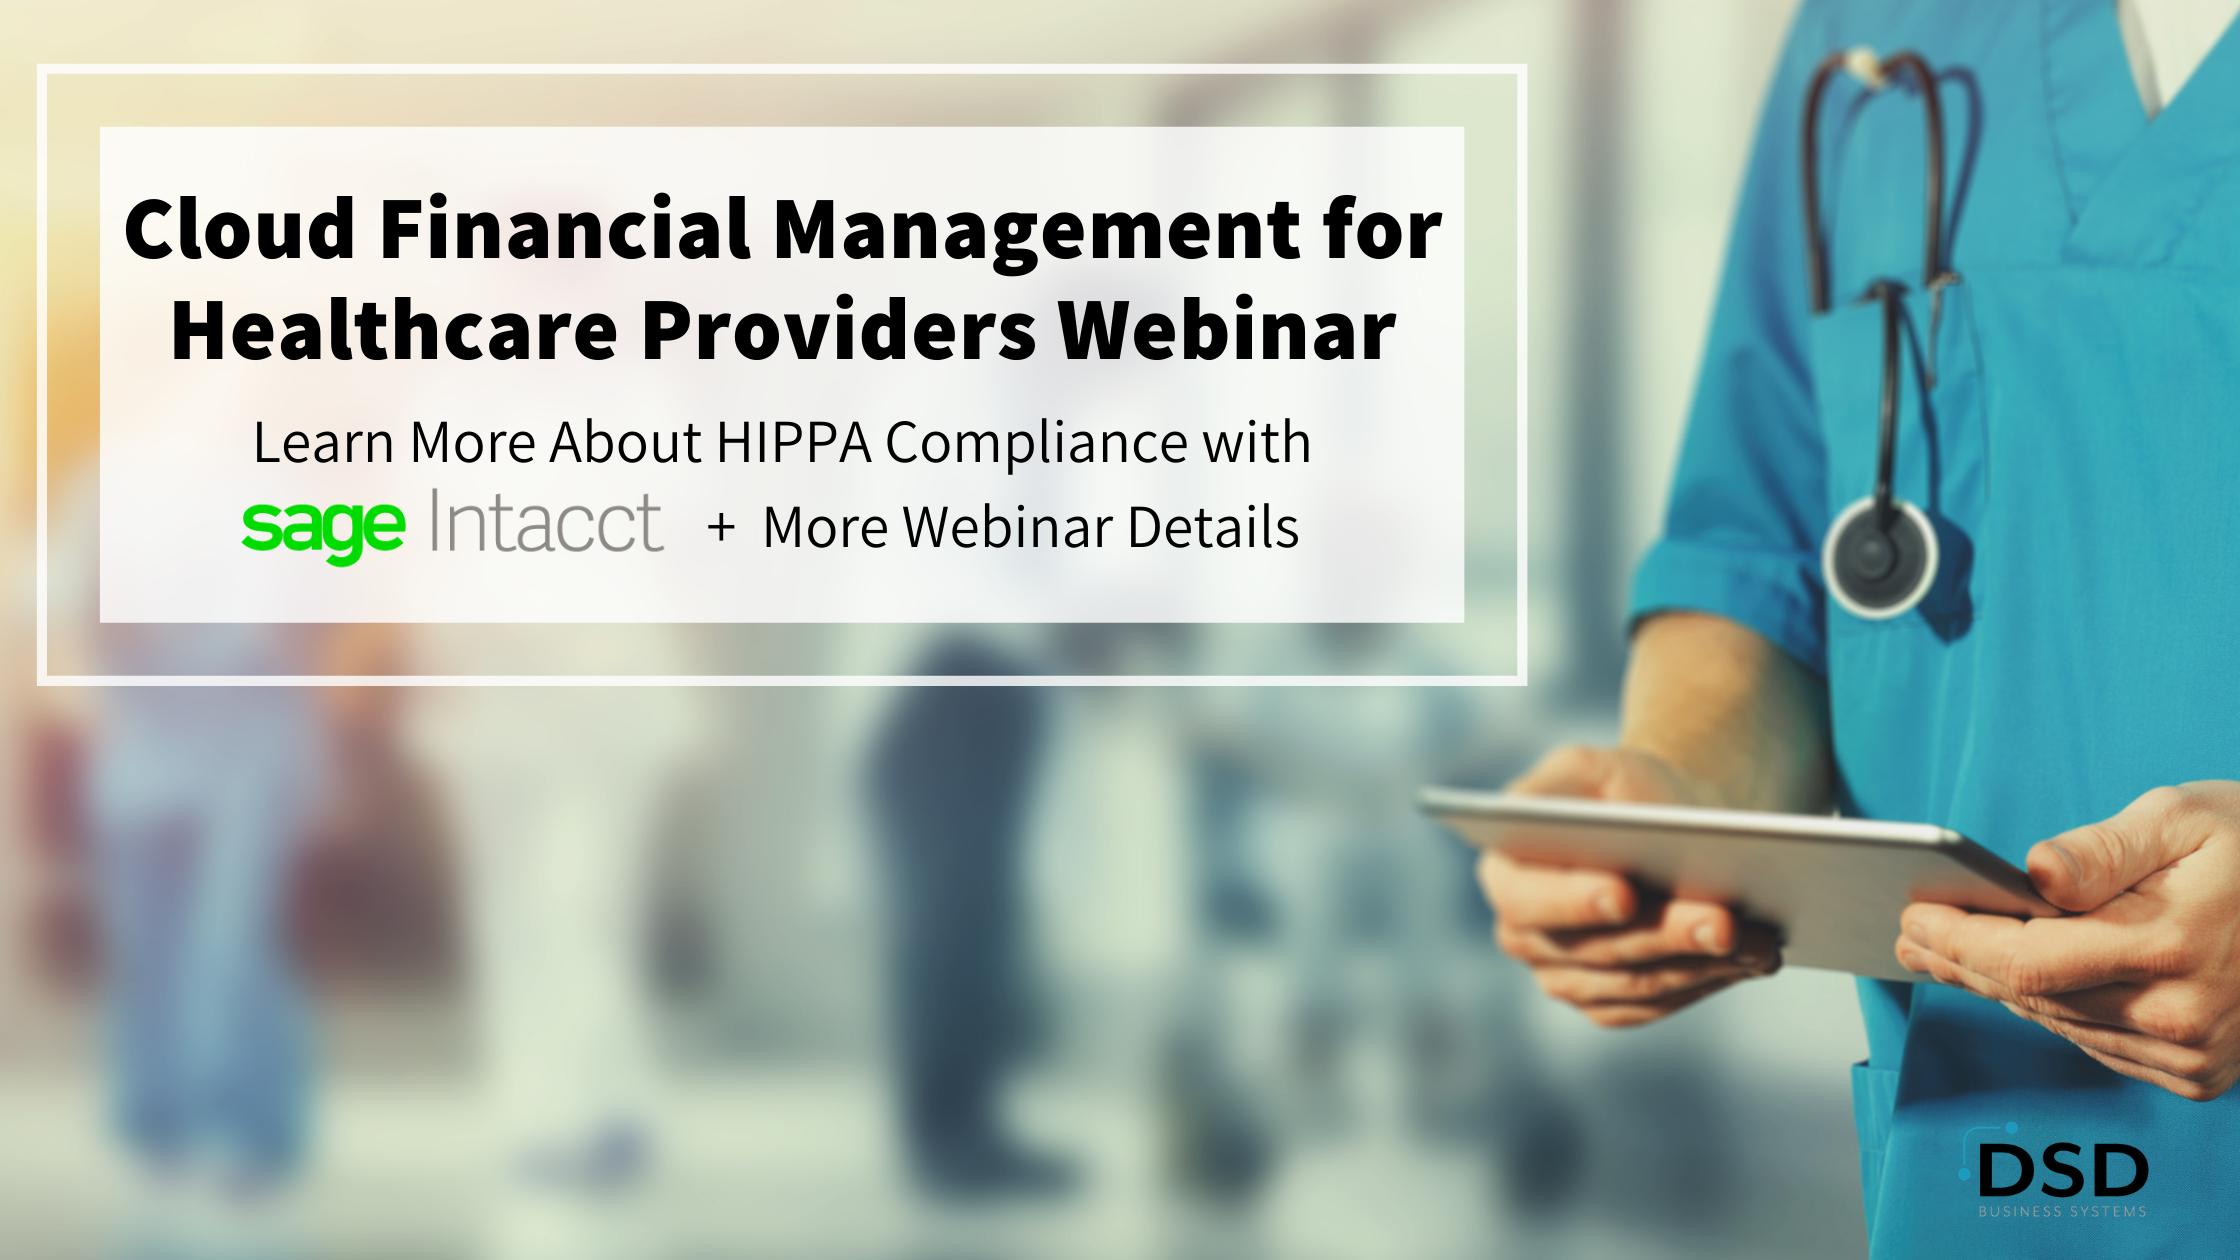 Cloud Financial Management for Healthcare Providers Webinar